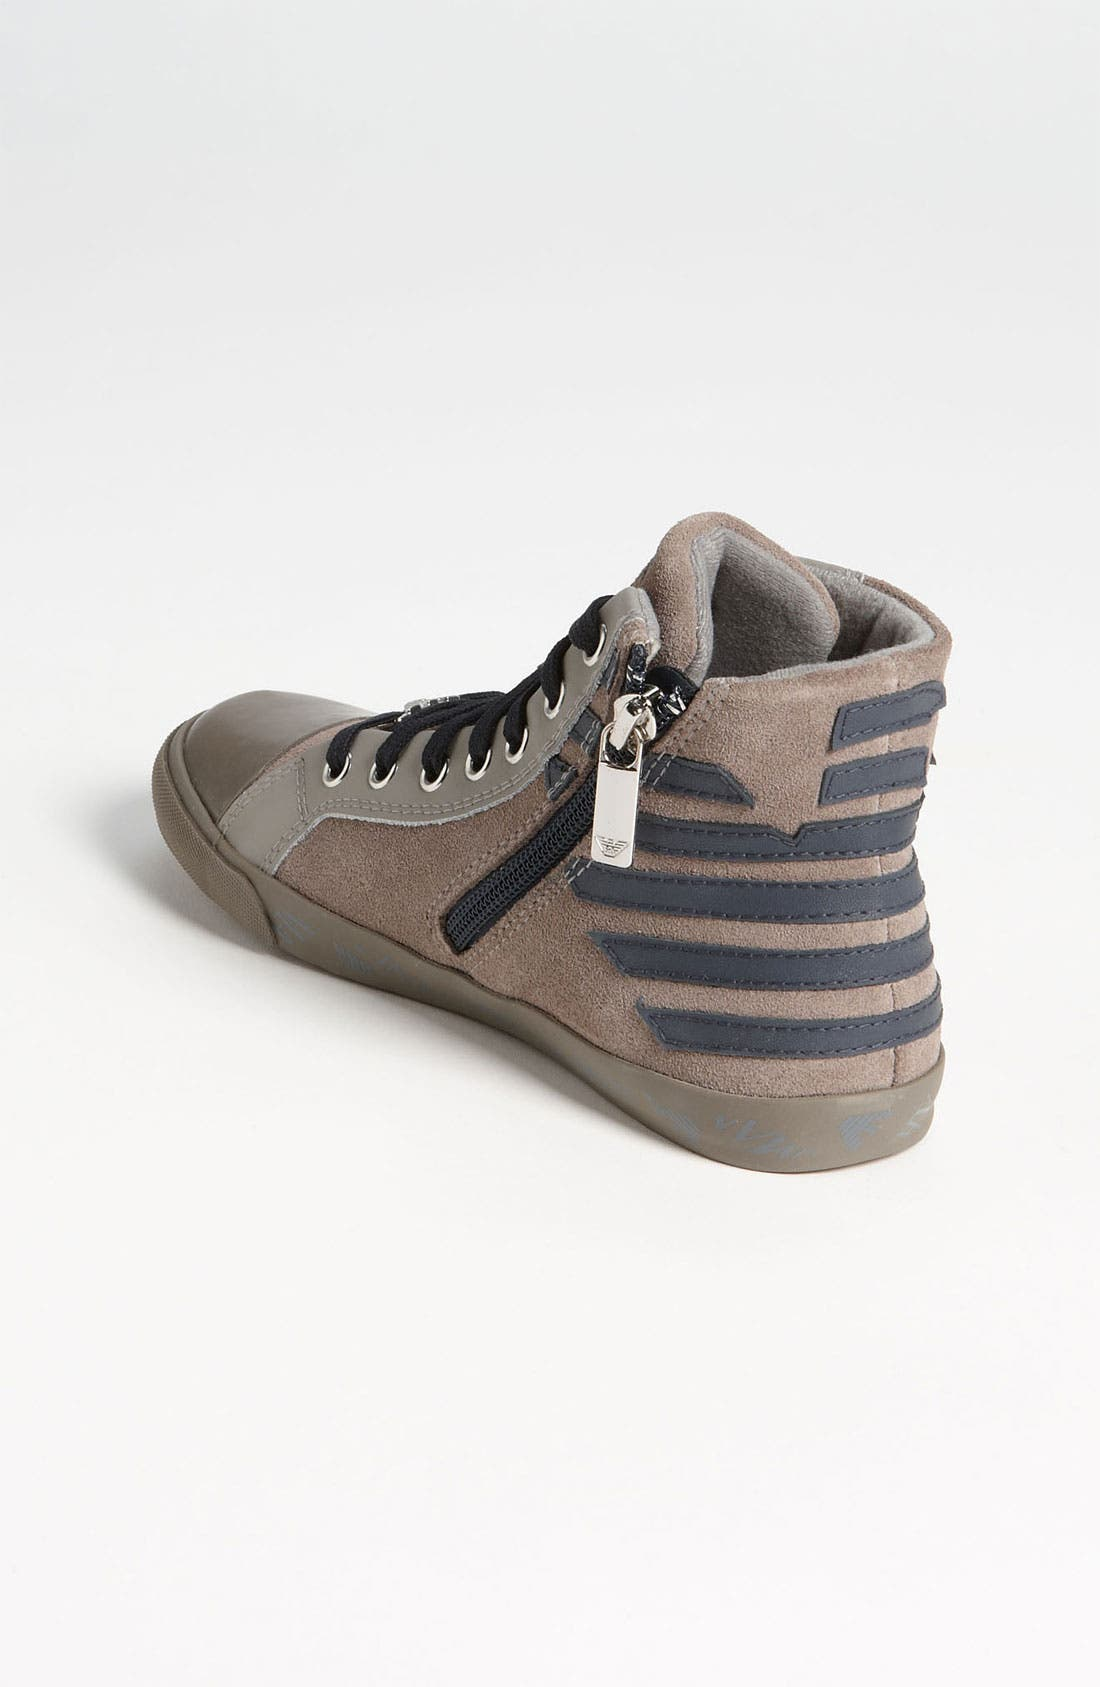 Alternate Image 2  - Armani Junior 'Eagle' Sneaker (Toddler, Little Kid & Big Kid)